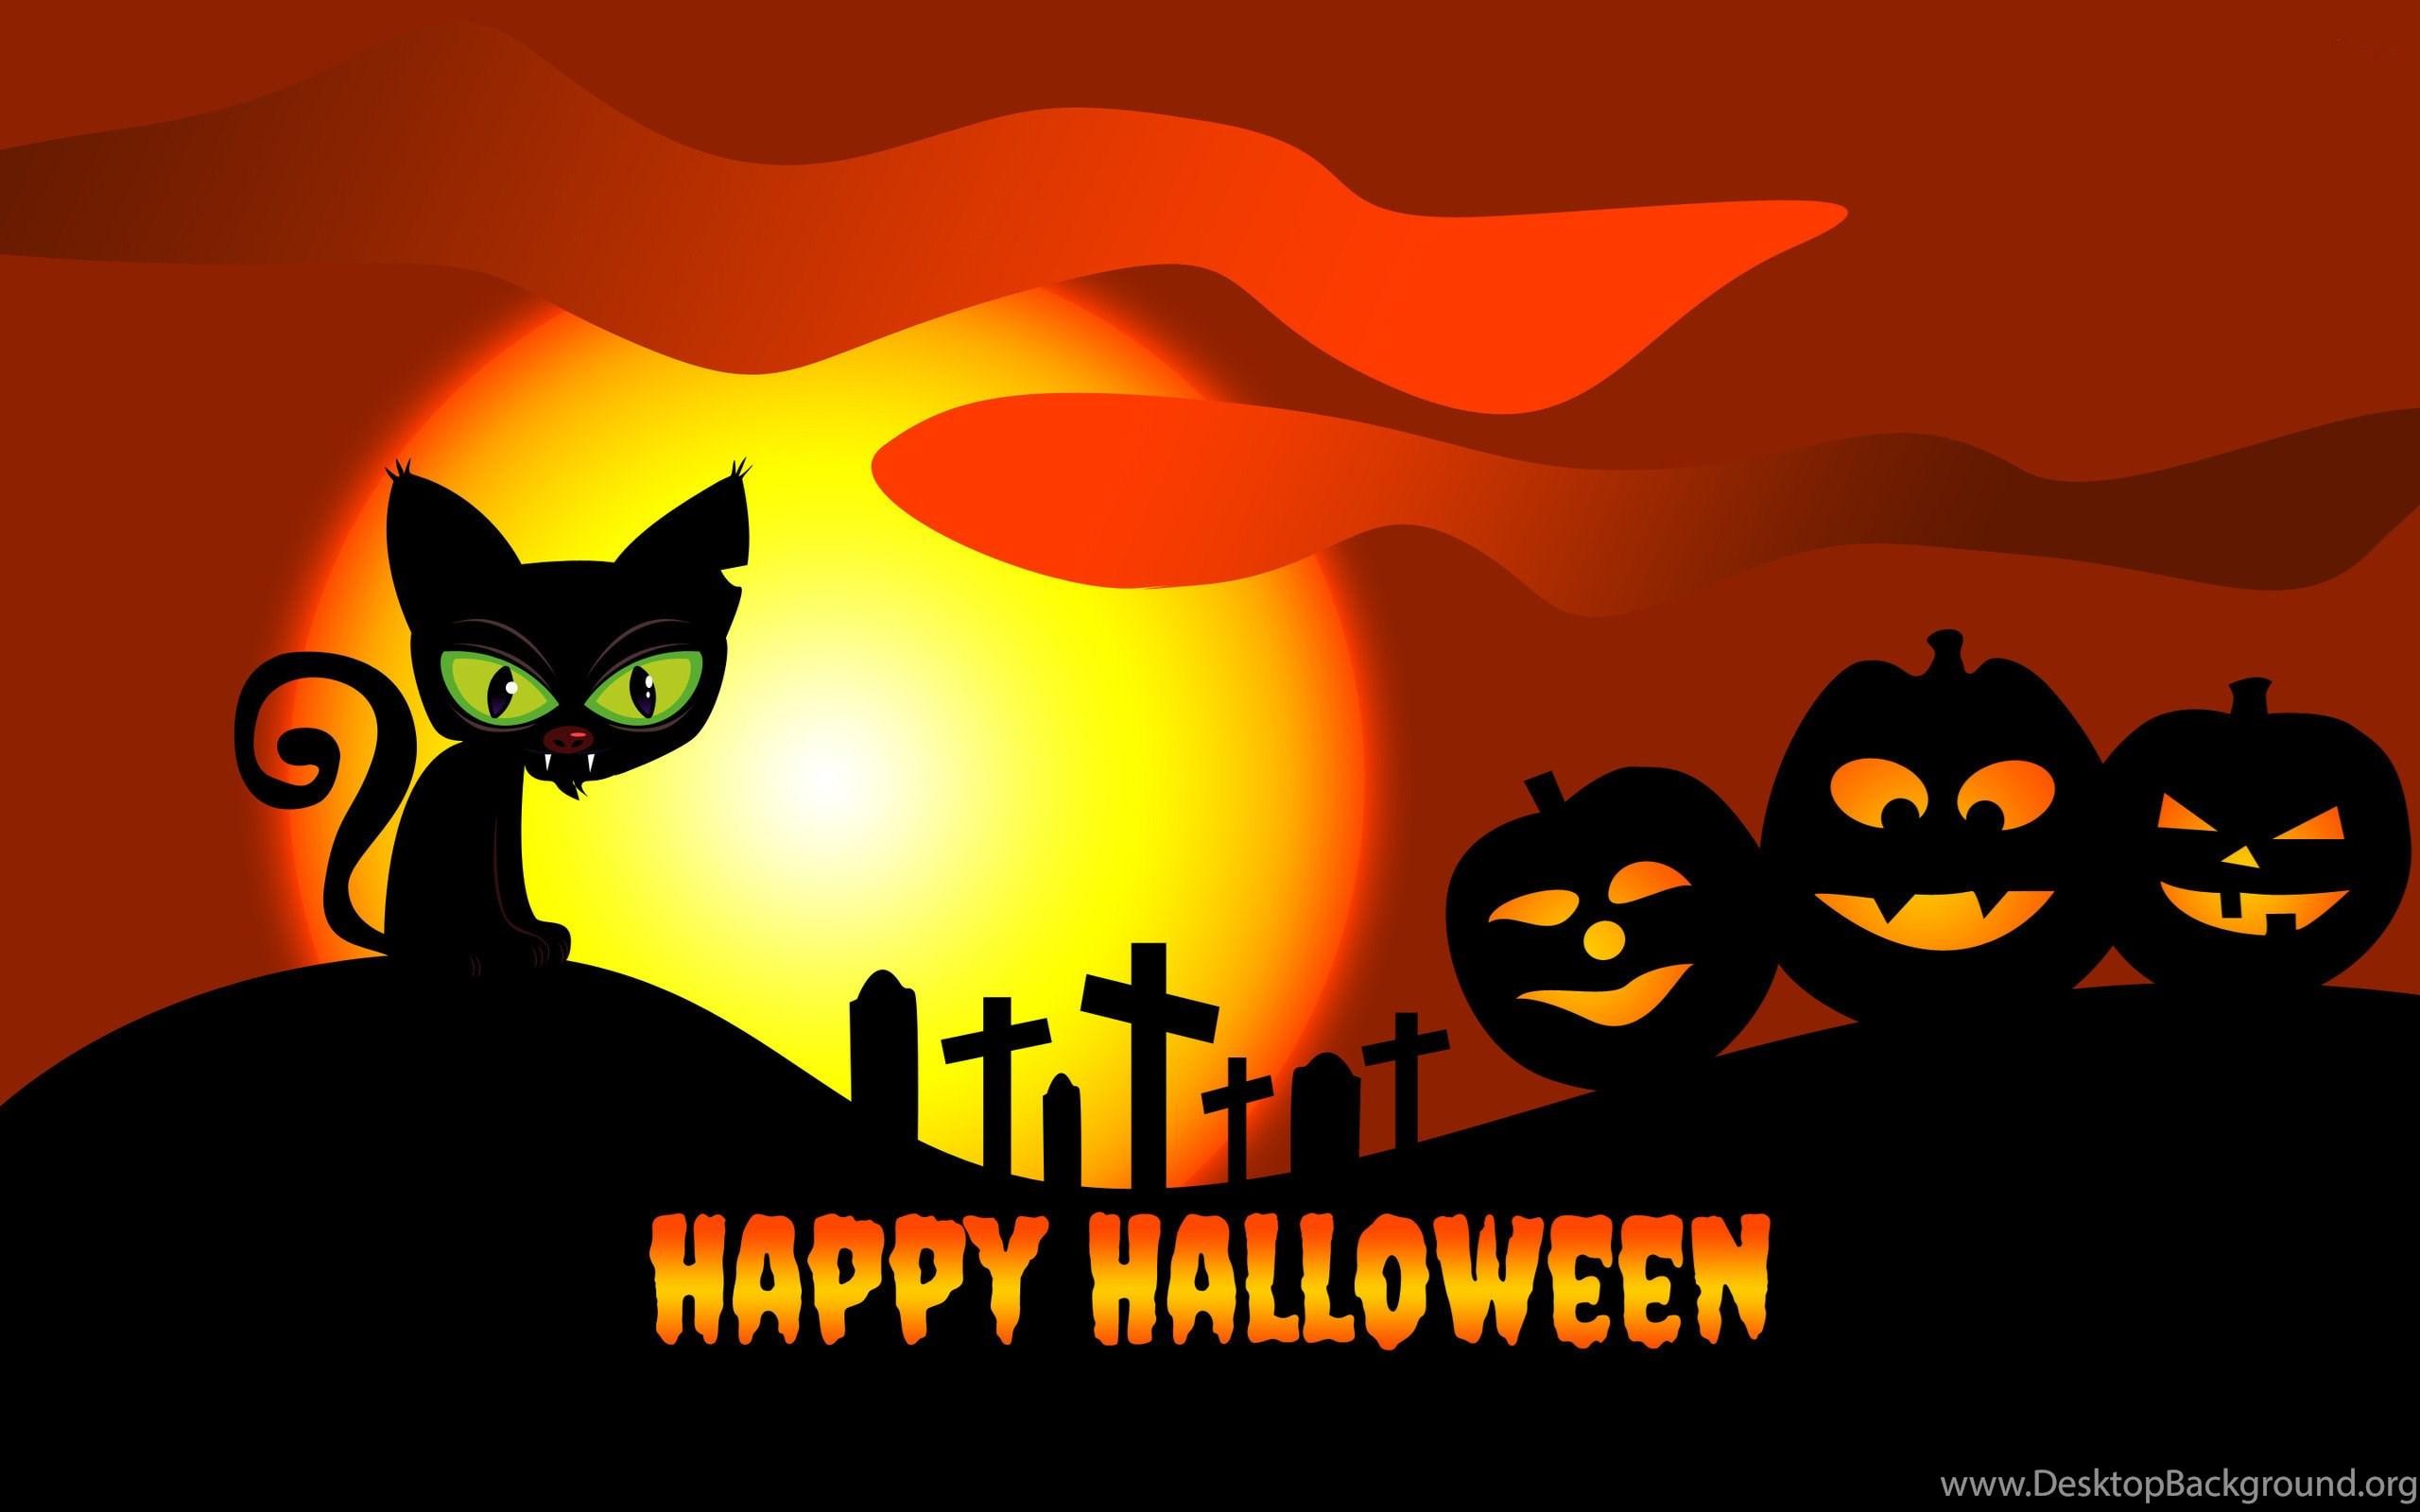 happy halloween wallpapers for mac ~bmj5wu free download desktop